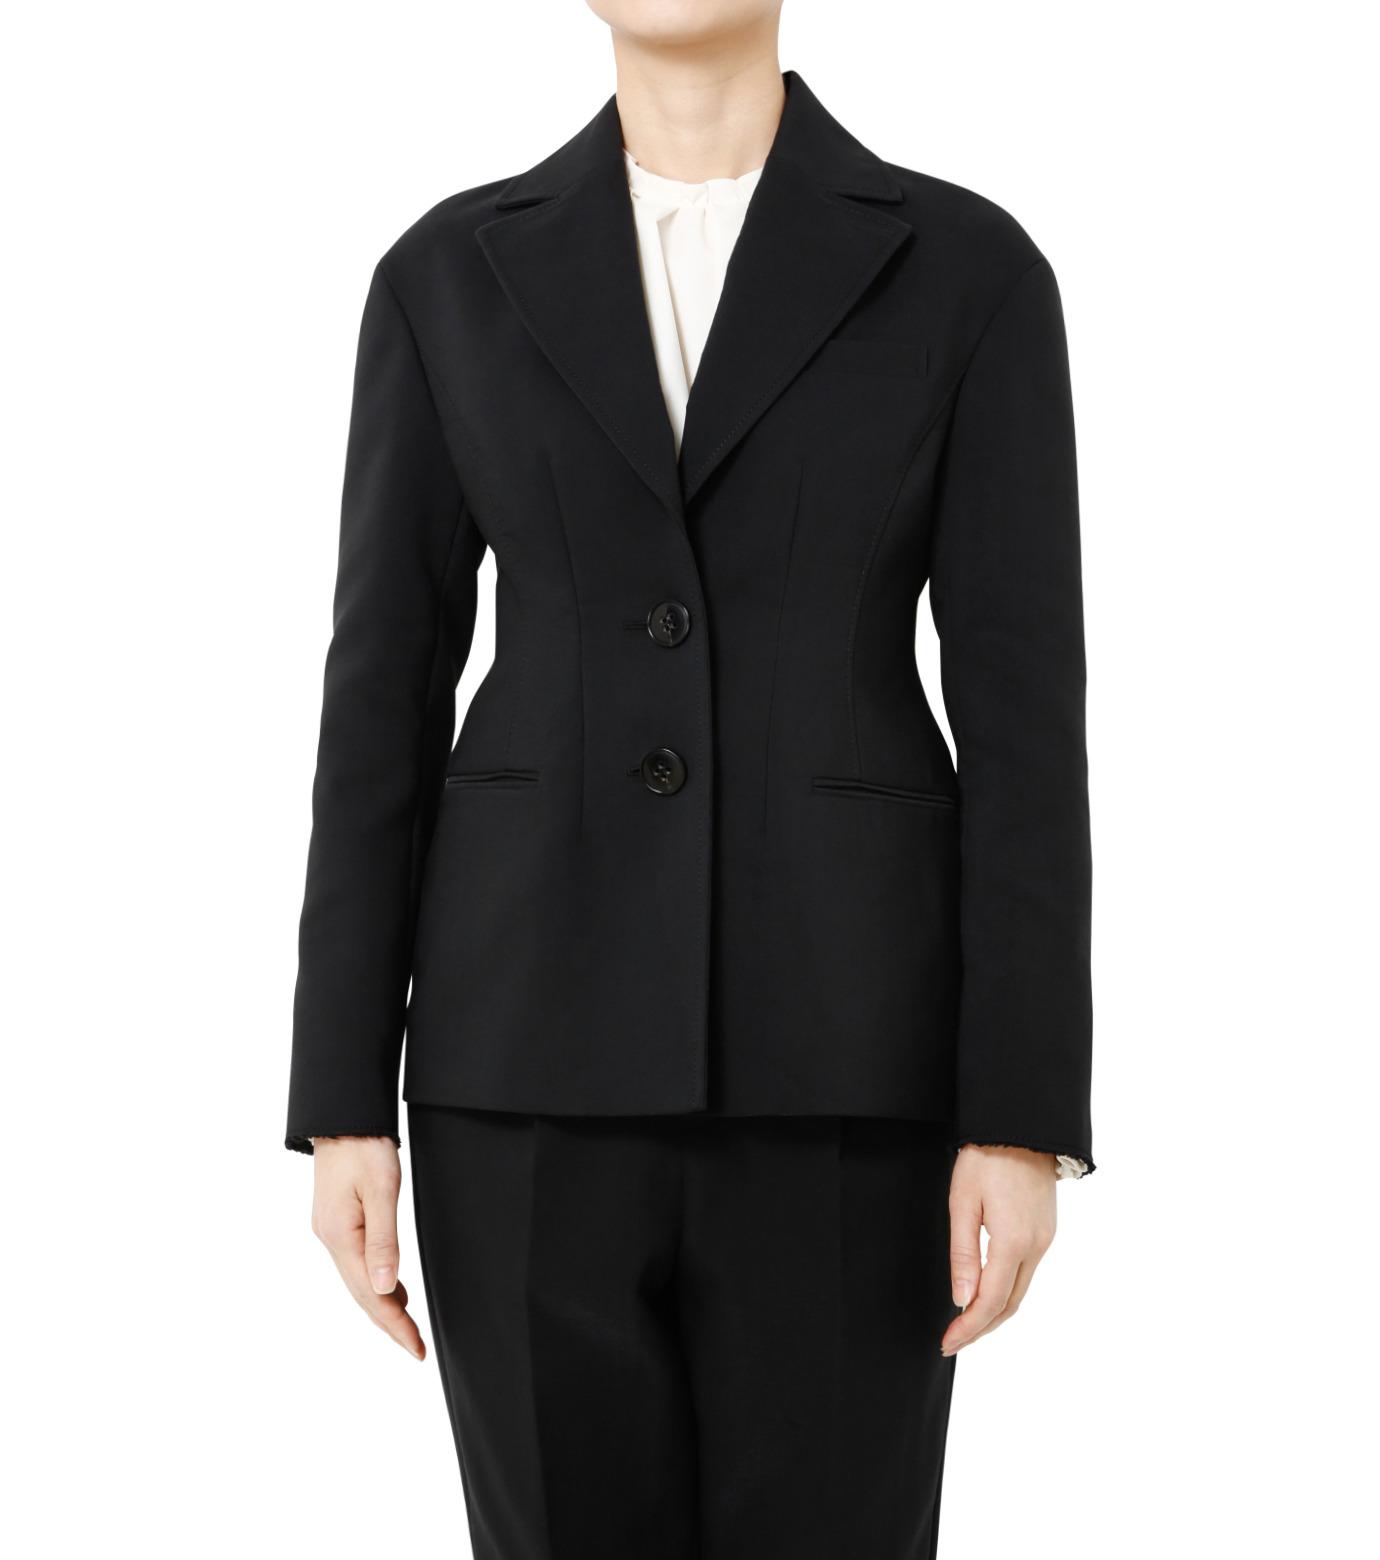 LE CIEL BLEU(ルシェルブルー)のデフォルメラインテーラージャケット-BLACK(ジャケット/jacket)-19S64103 拡大詳細画像5